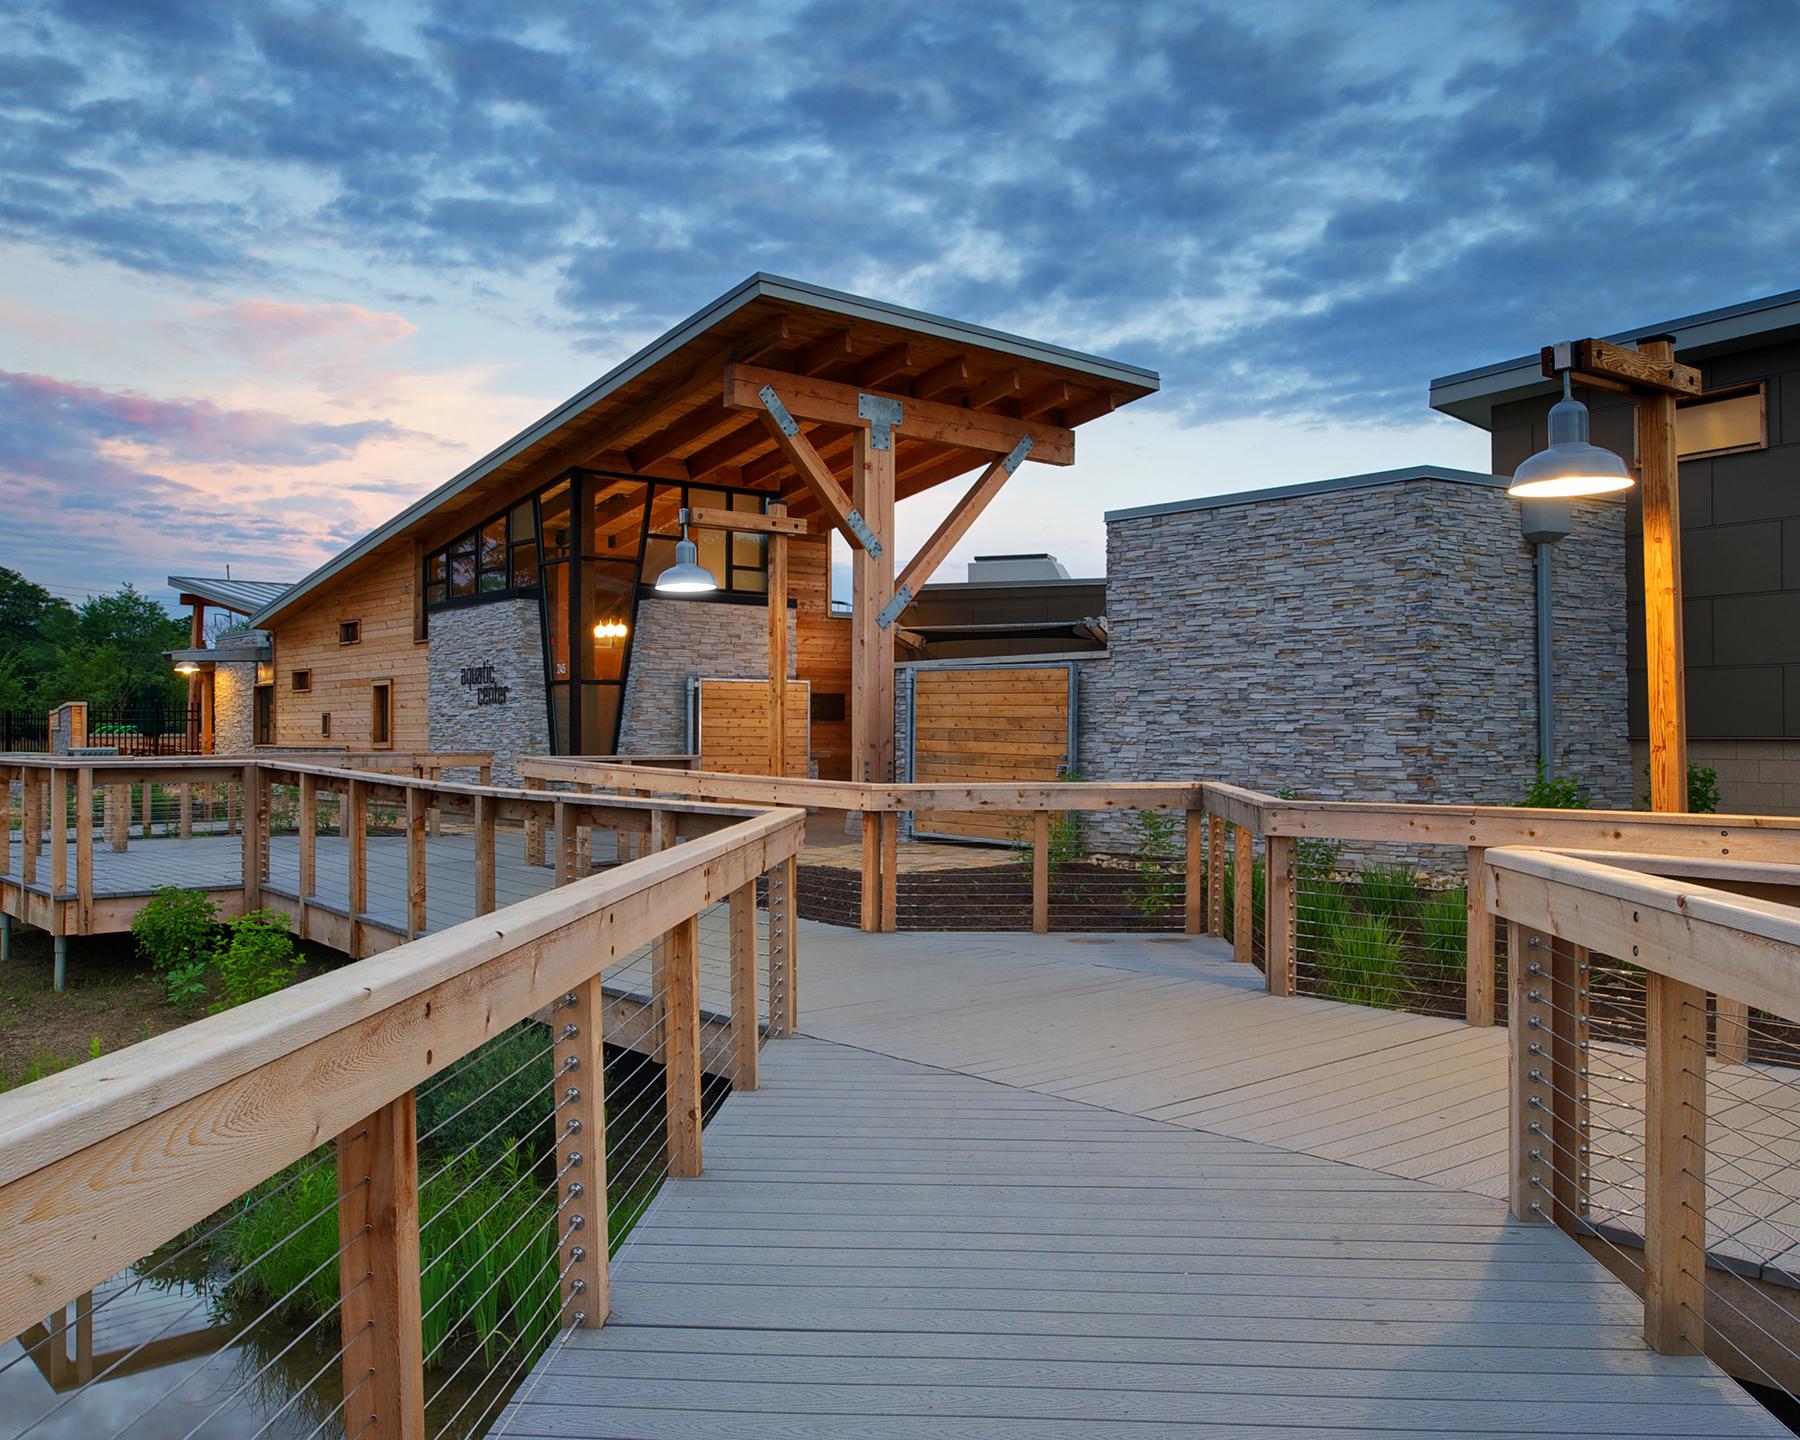 Honor Award   Highlands Park Family Aquatic Center, designed by Meyers + Associates Architecture